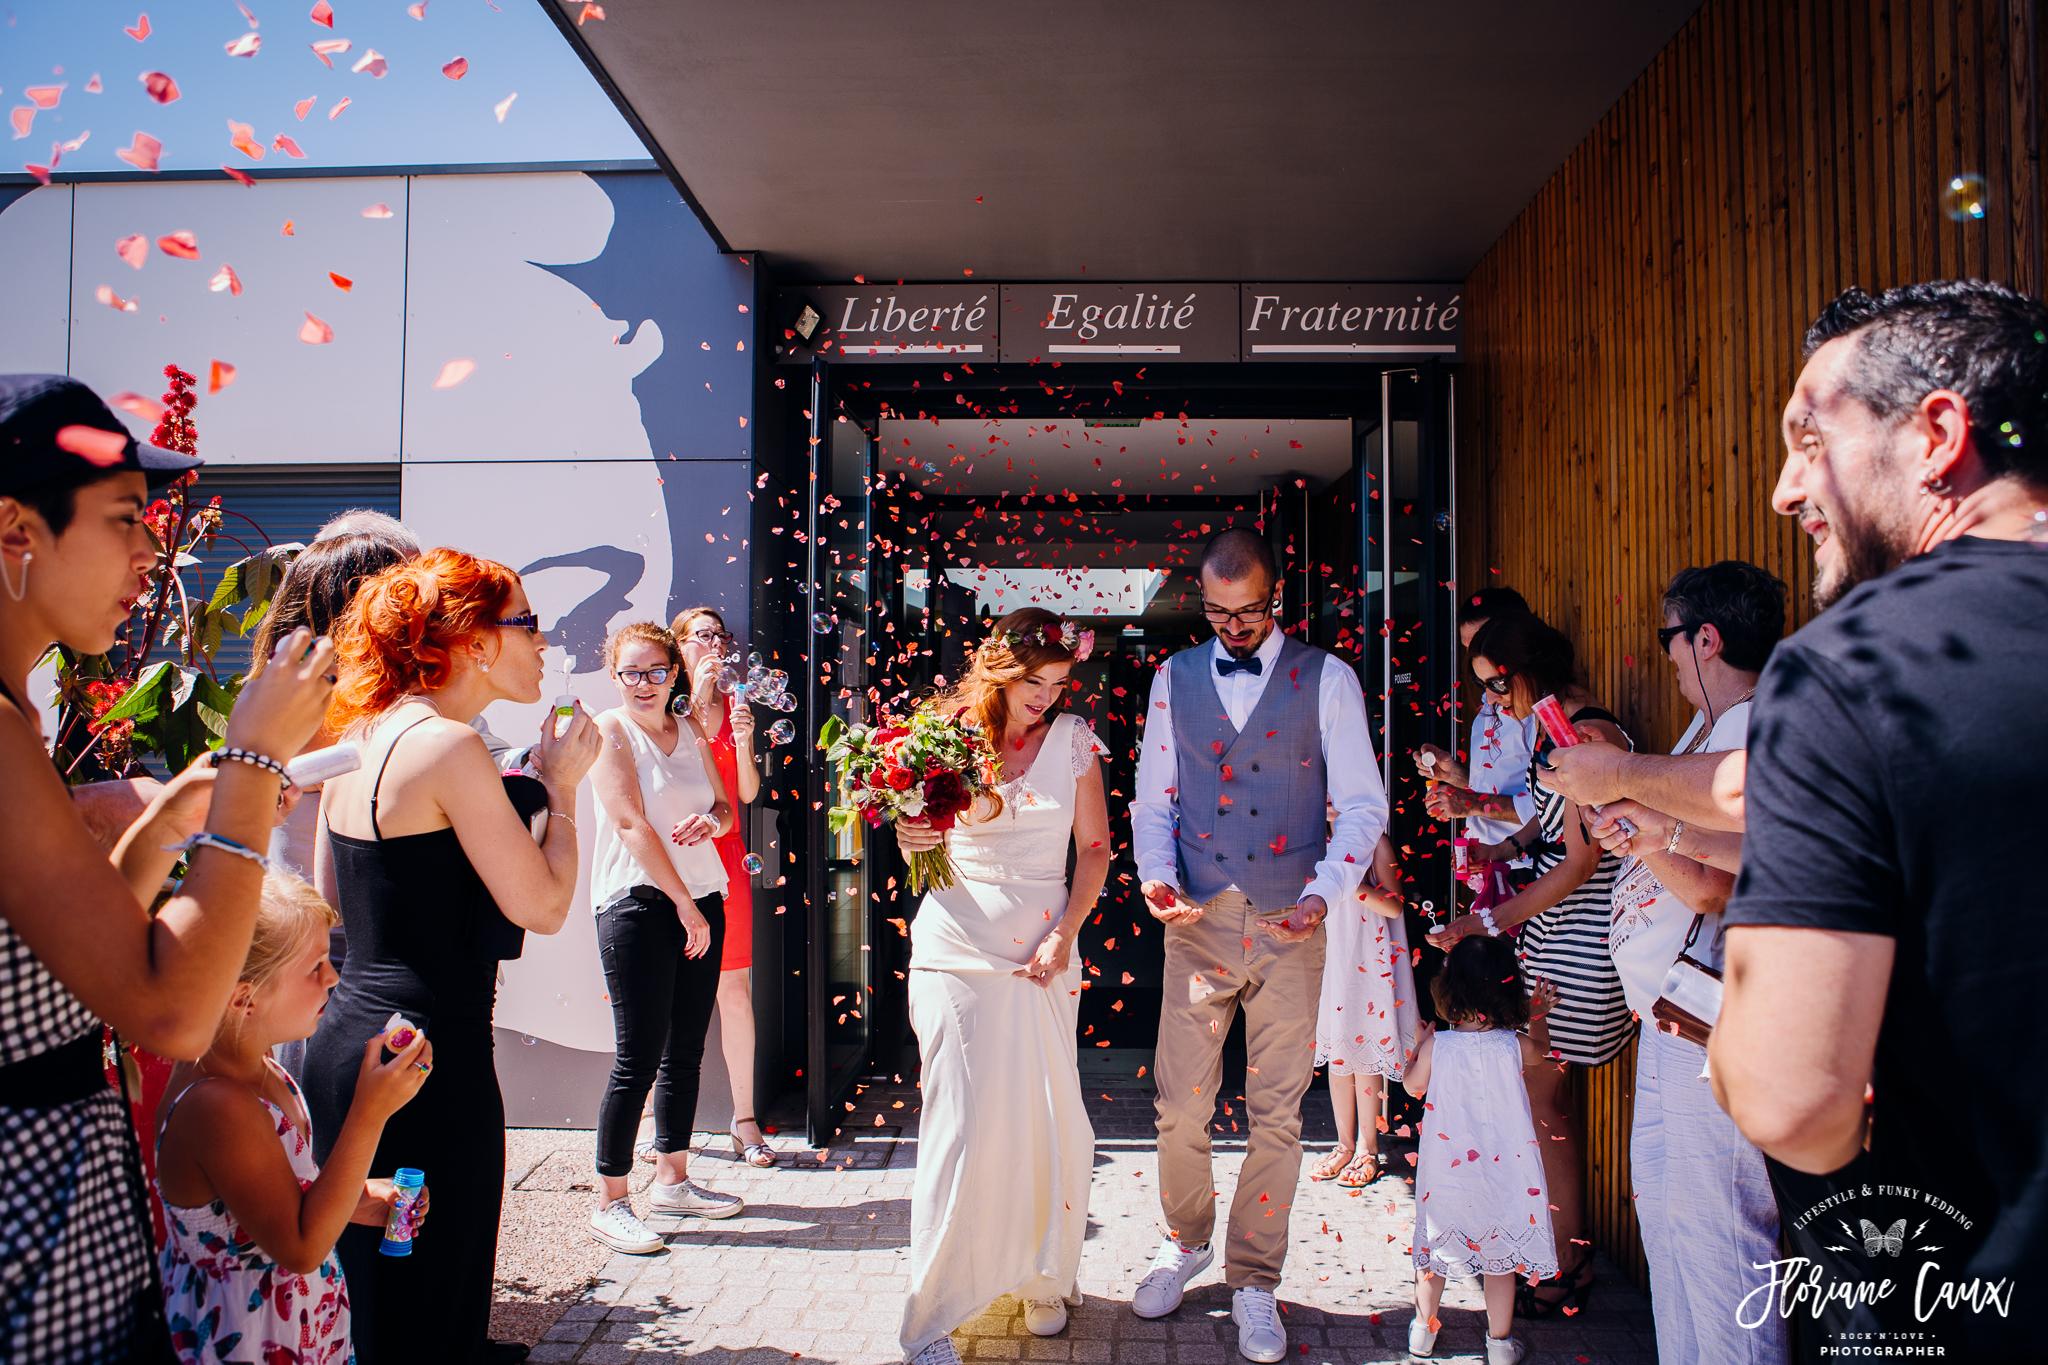 photographe-mariage-toulouse-rocknroll-maries-tatoues-floriane-caux-39